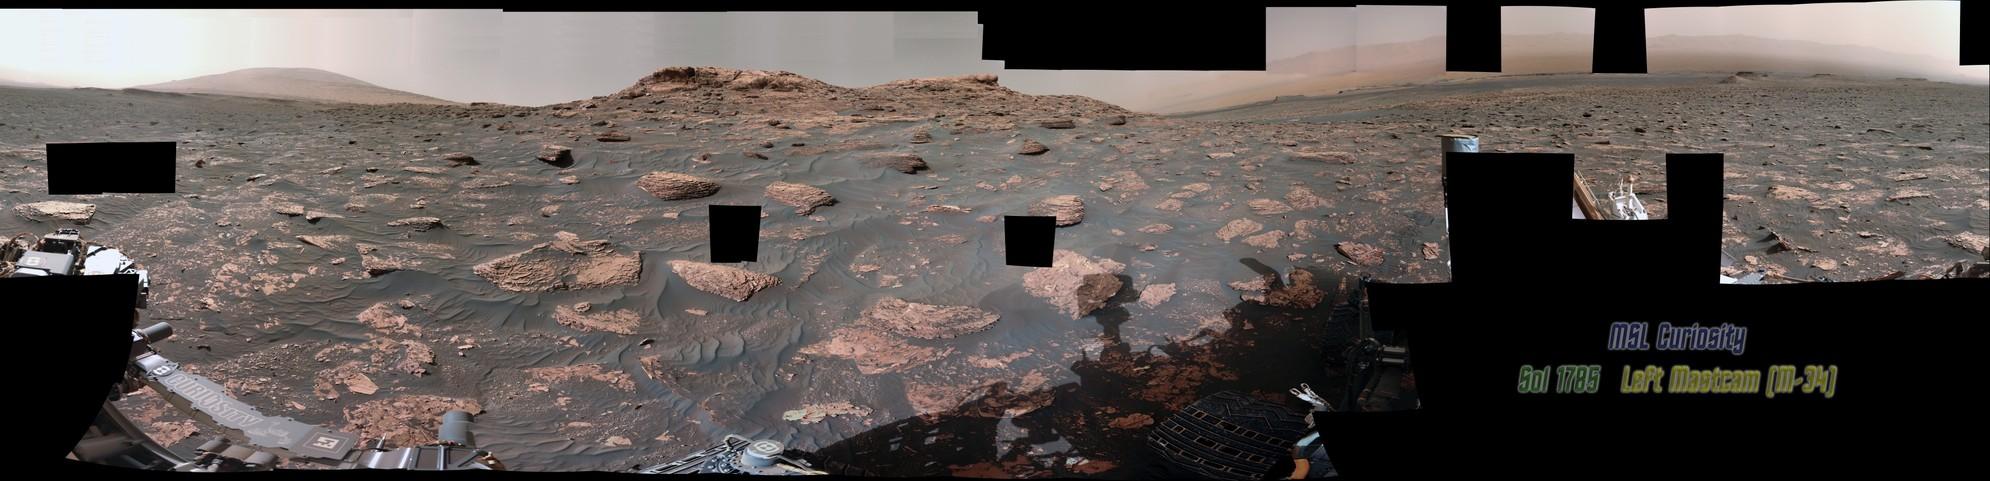 MSL Curiosity Rover - Sol 1785 - M34 - Left Mastcam  (Pds)